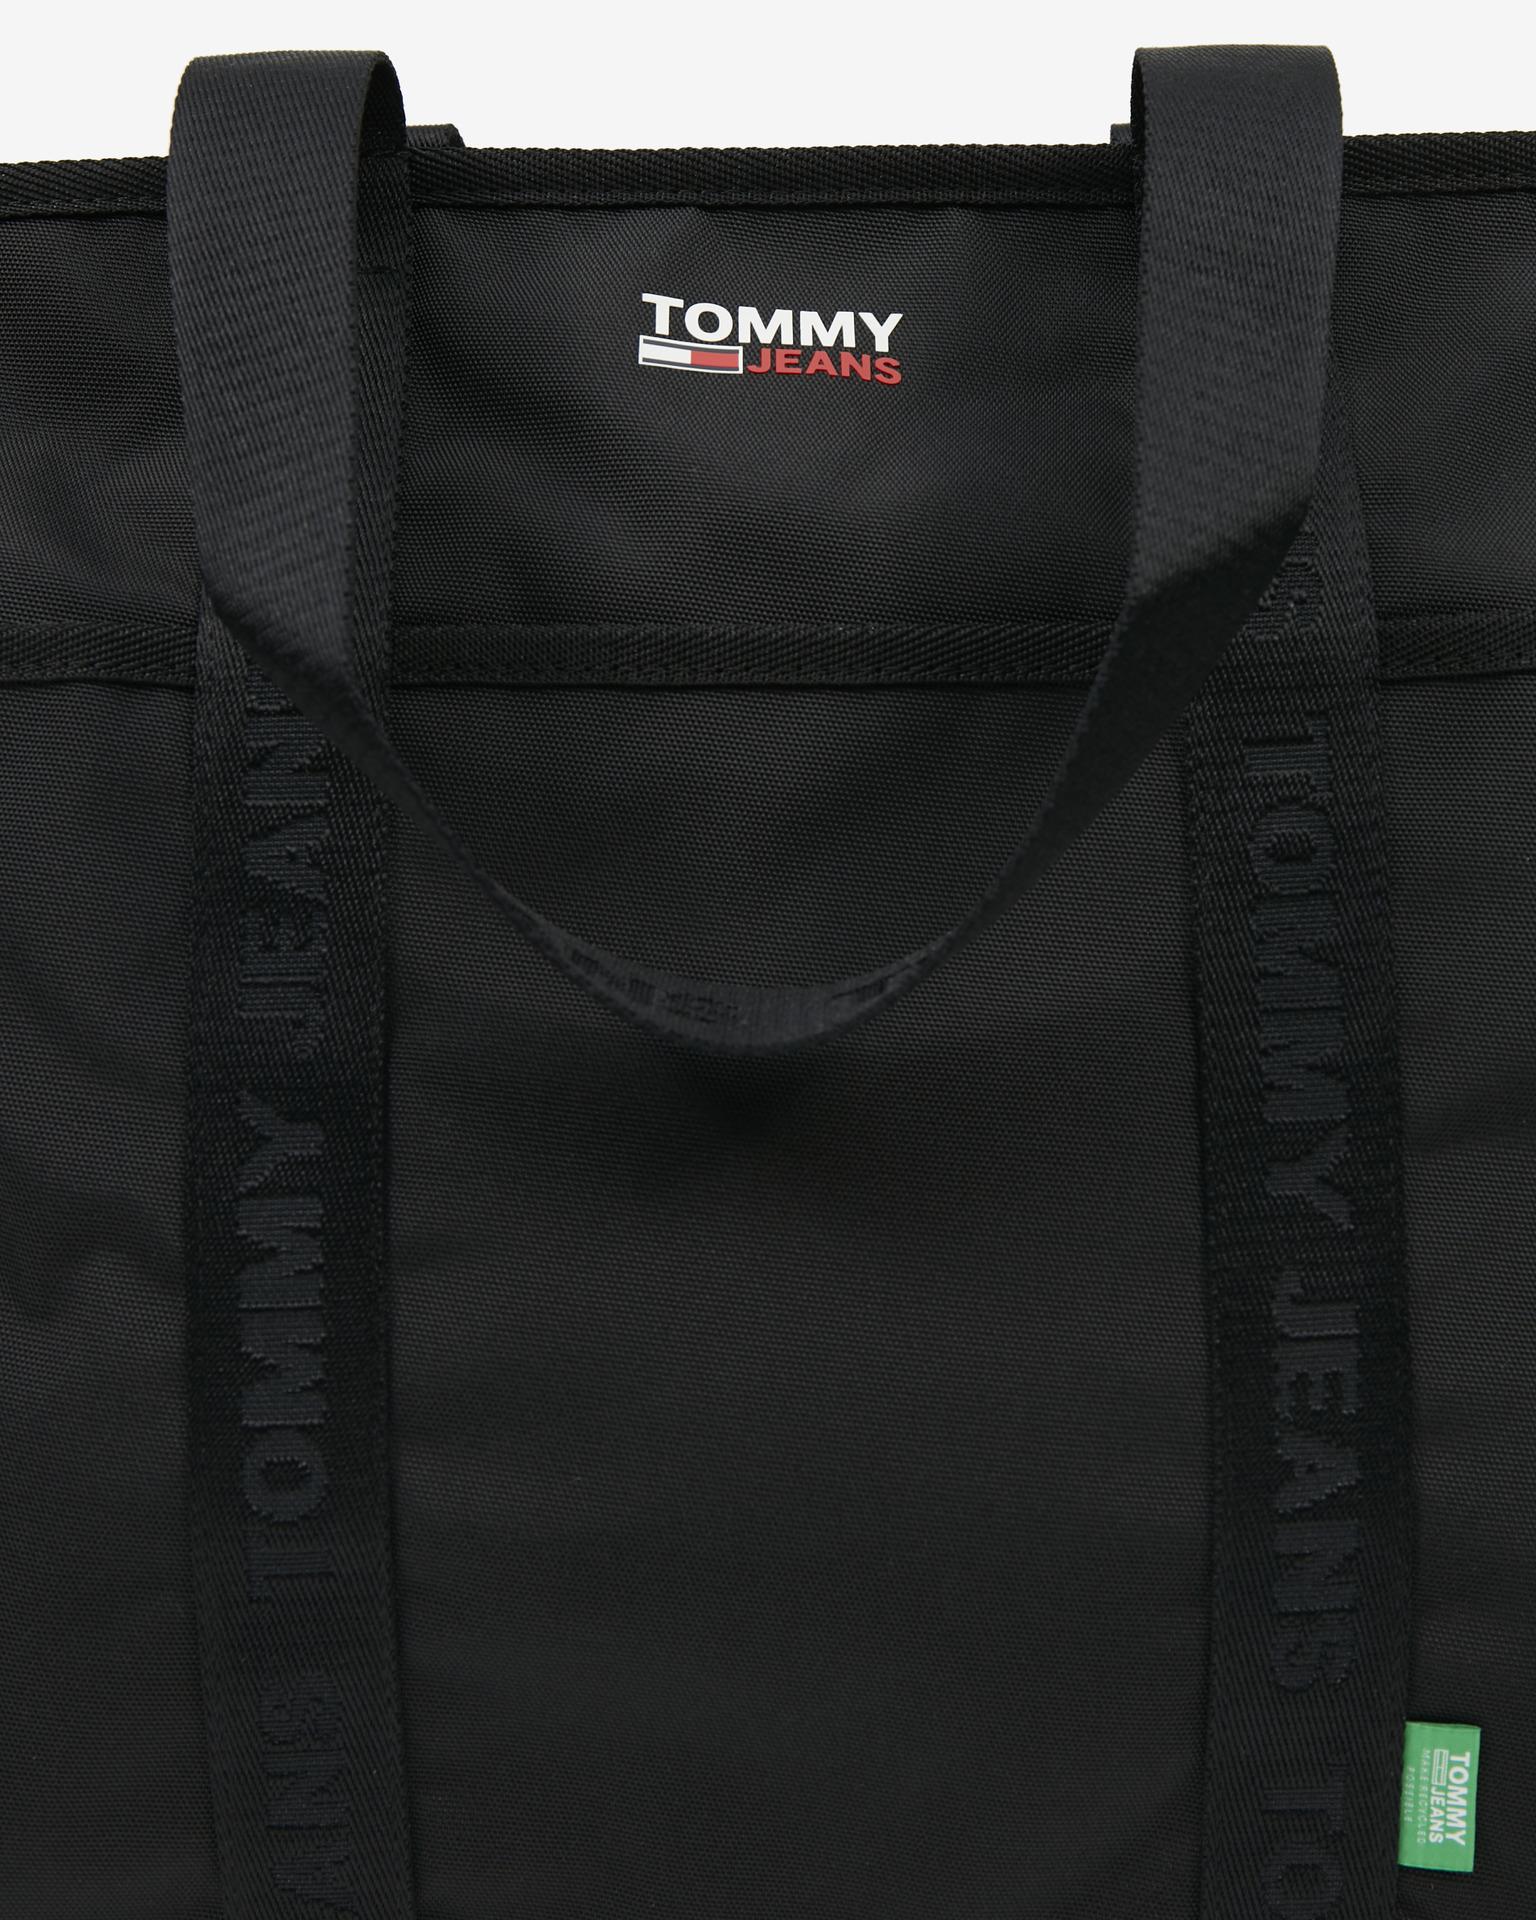 Tommy Jeans Borsetta donna nero Taška